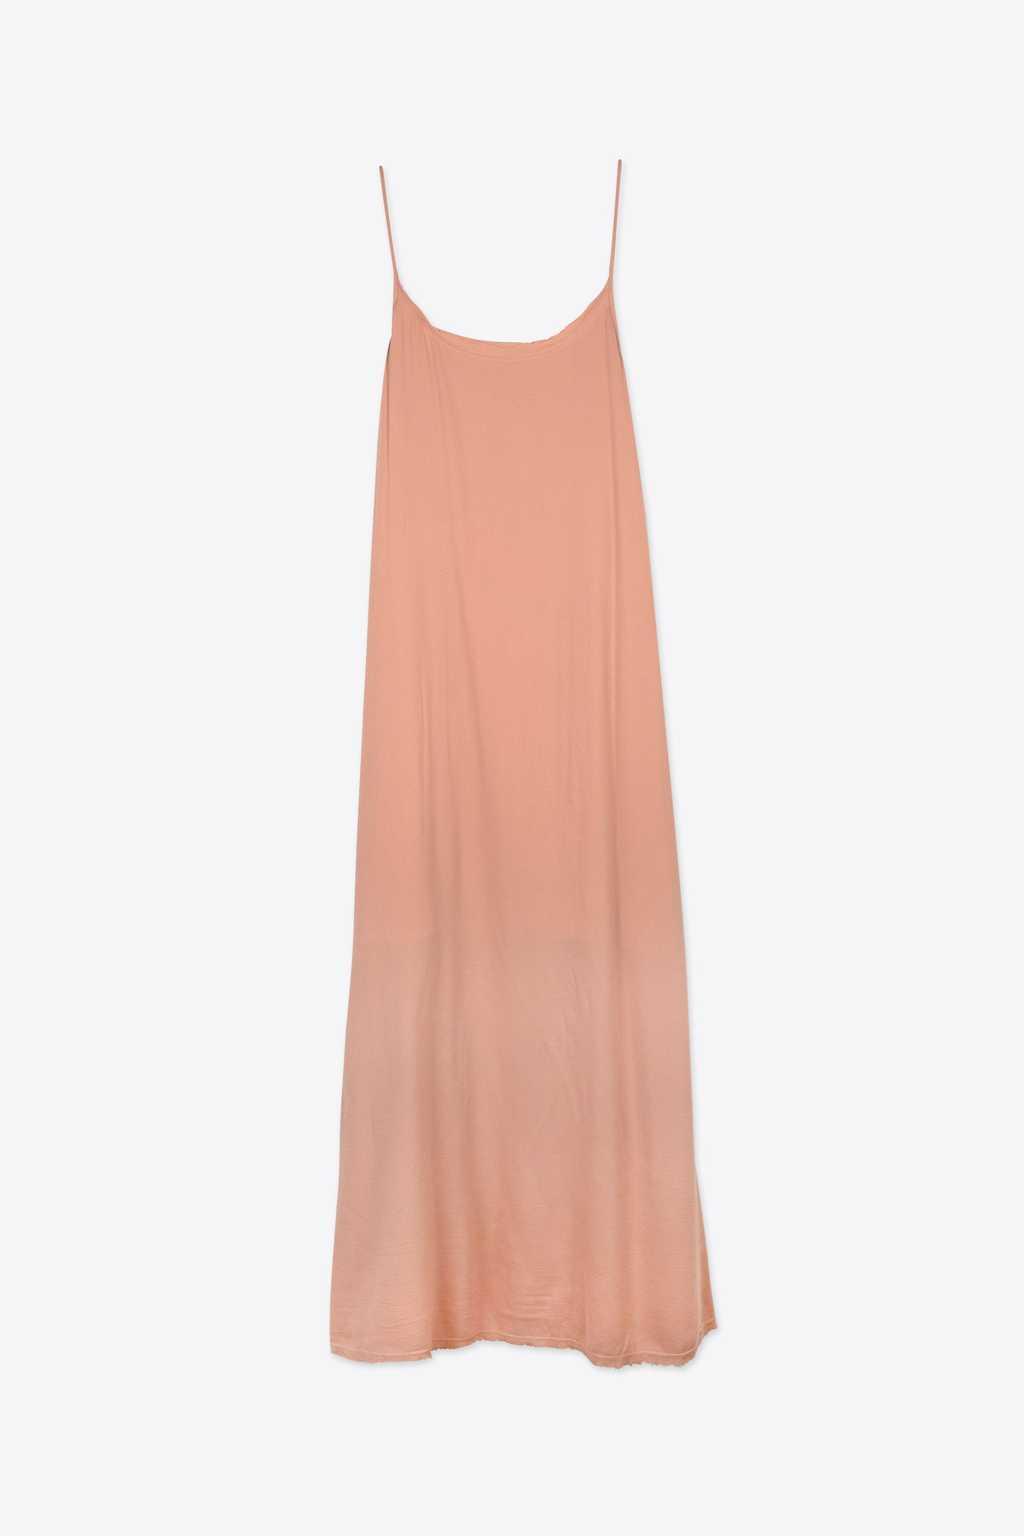 Dress 1306 Clay 5